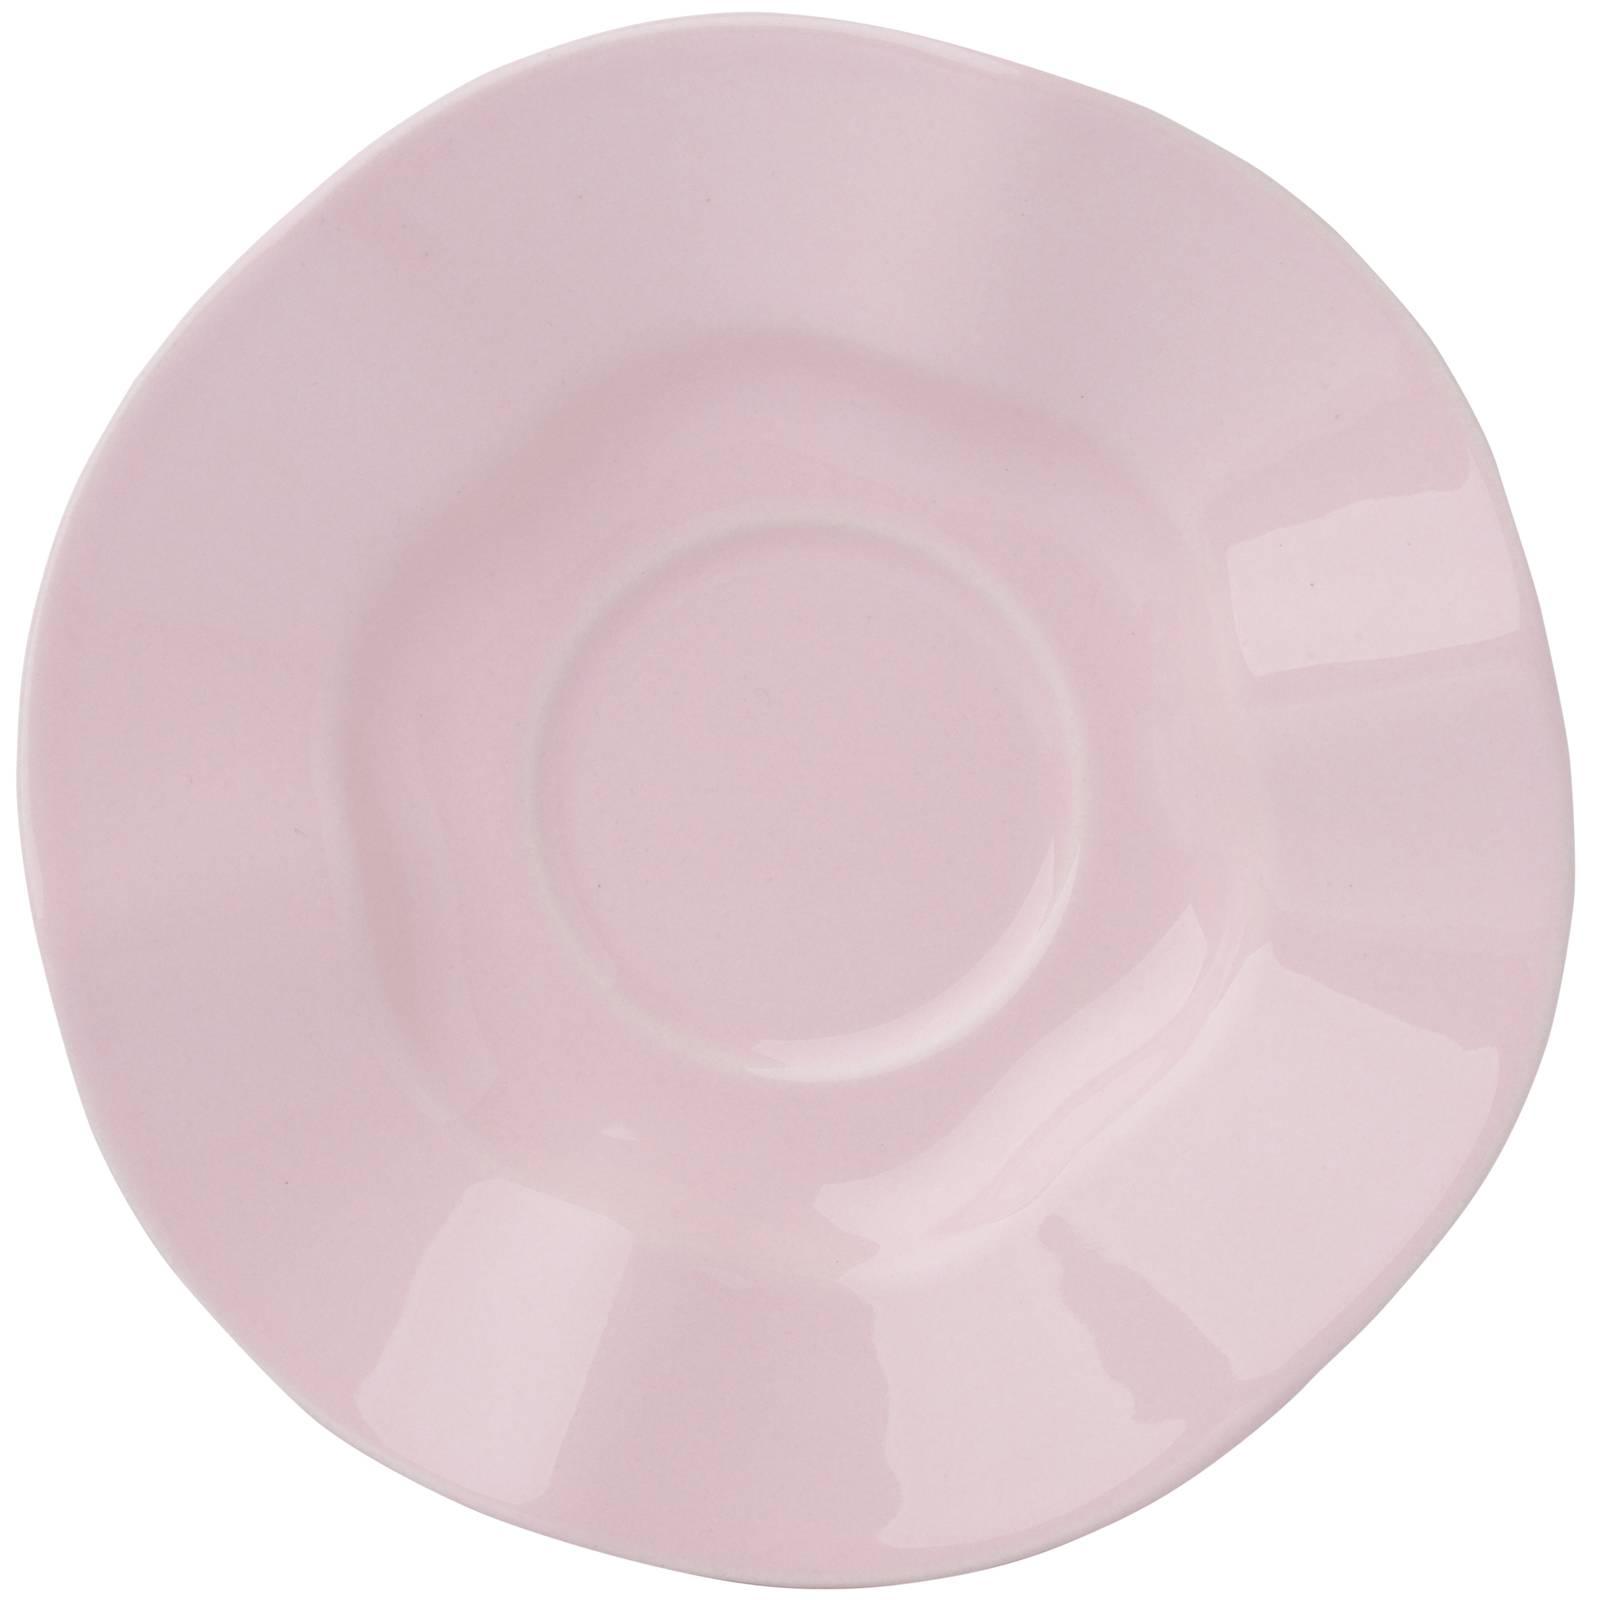 Untertasse Diana Rustic Pink 15 cm AMBITION